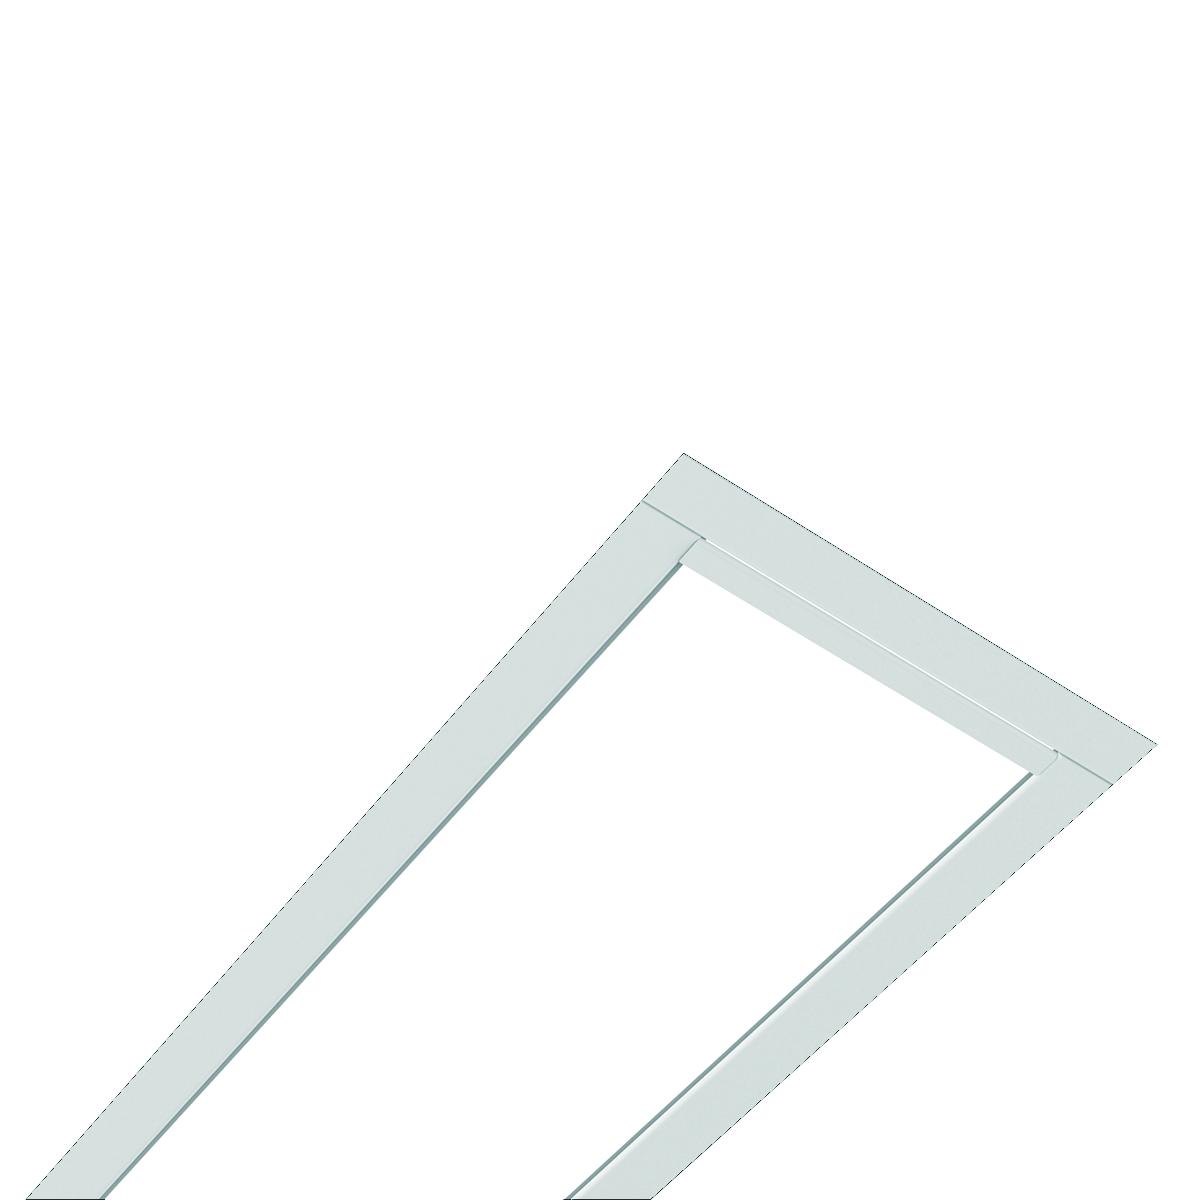 MOD™ 4L LED Recessed Slot | Litecontrol